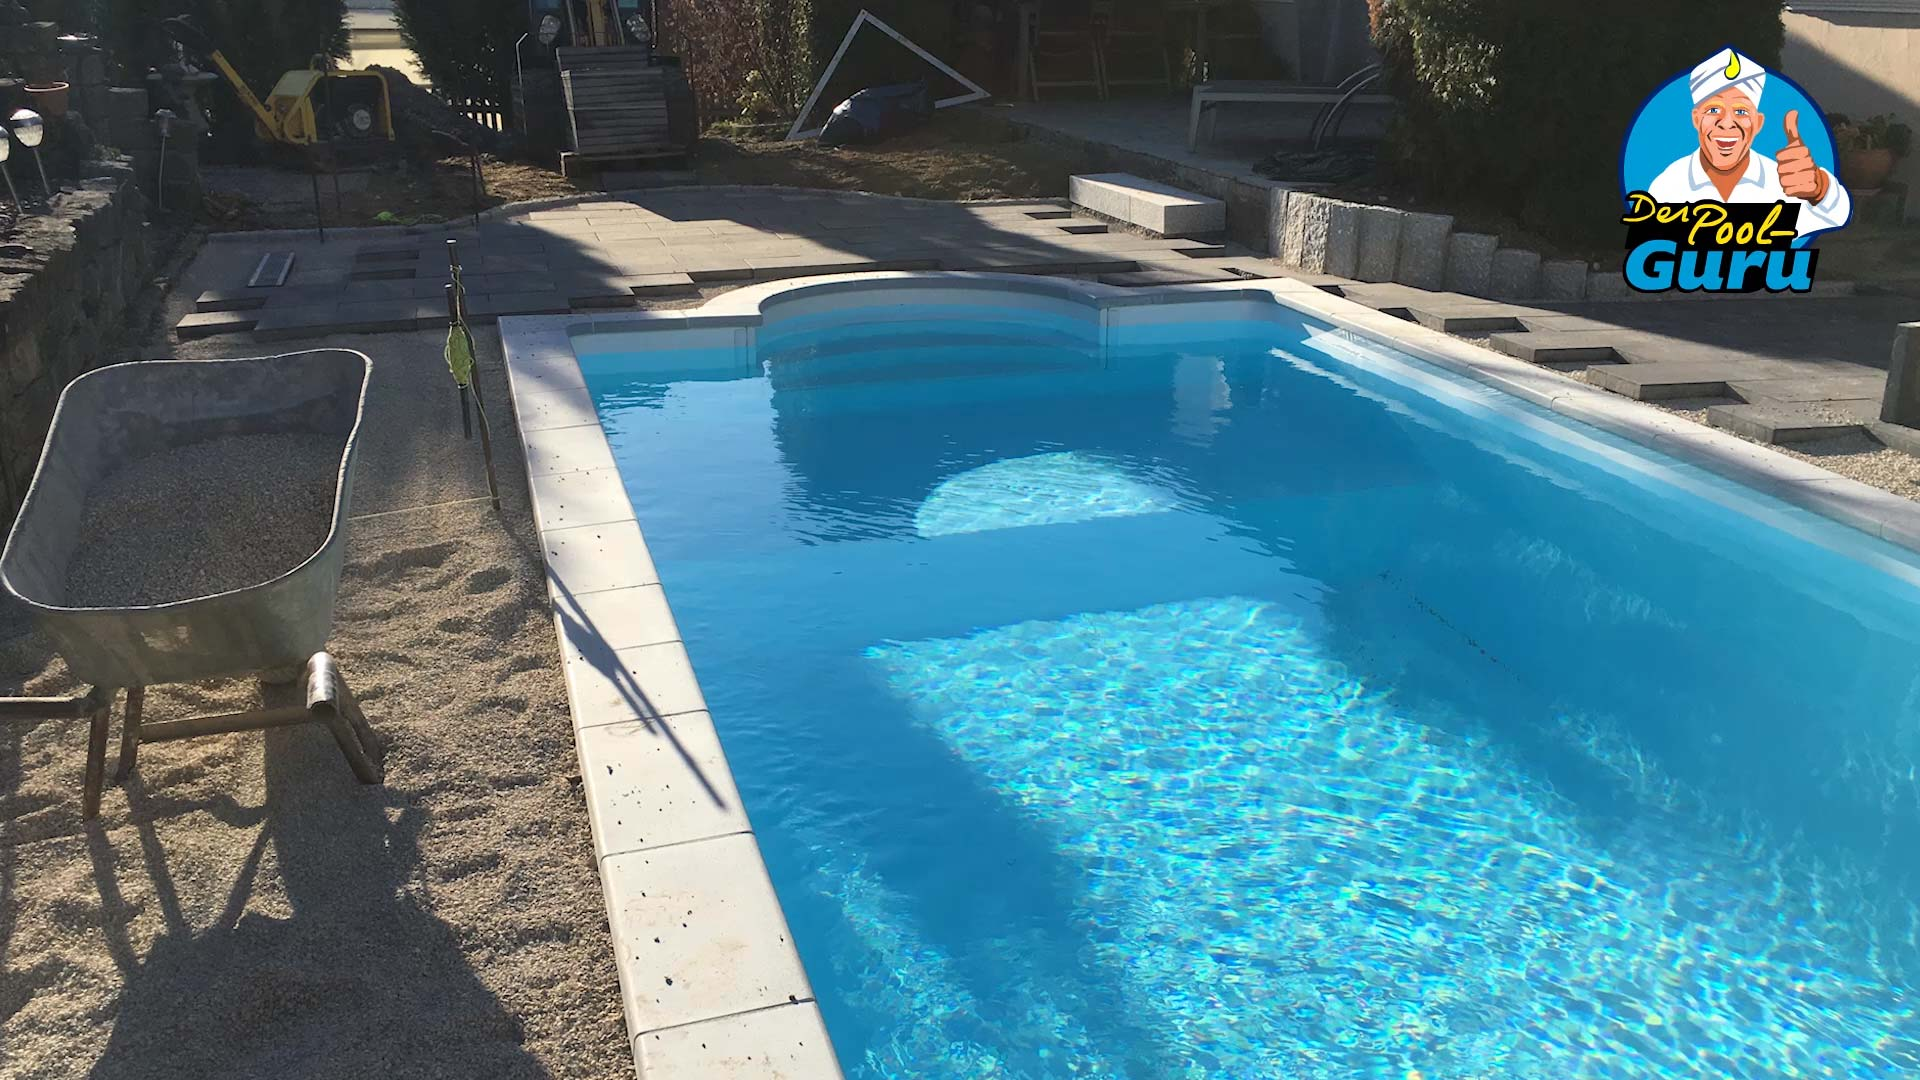 Pool bauen Fliesen legen